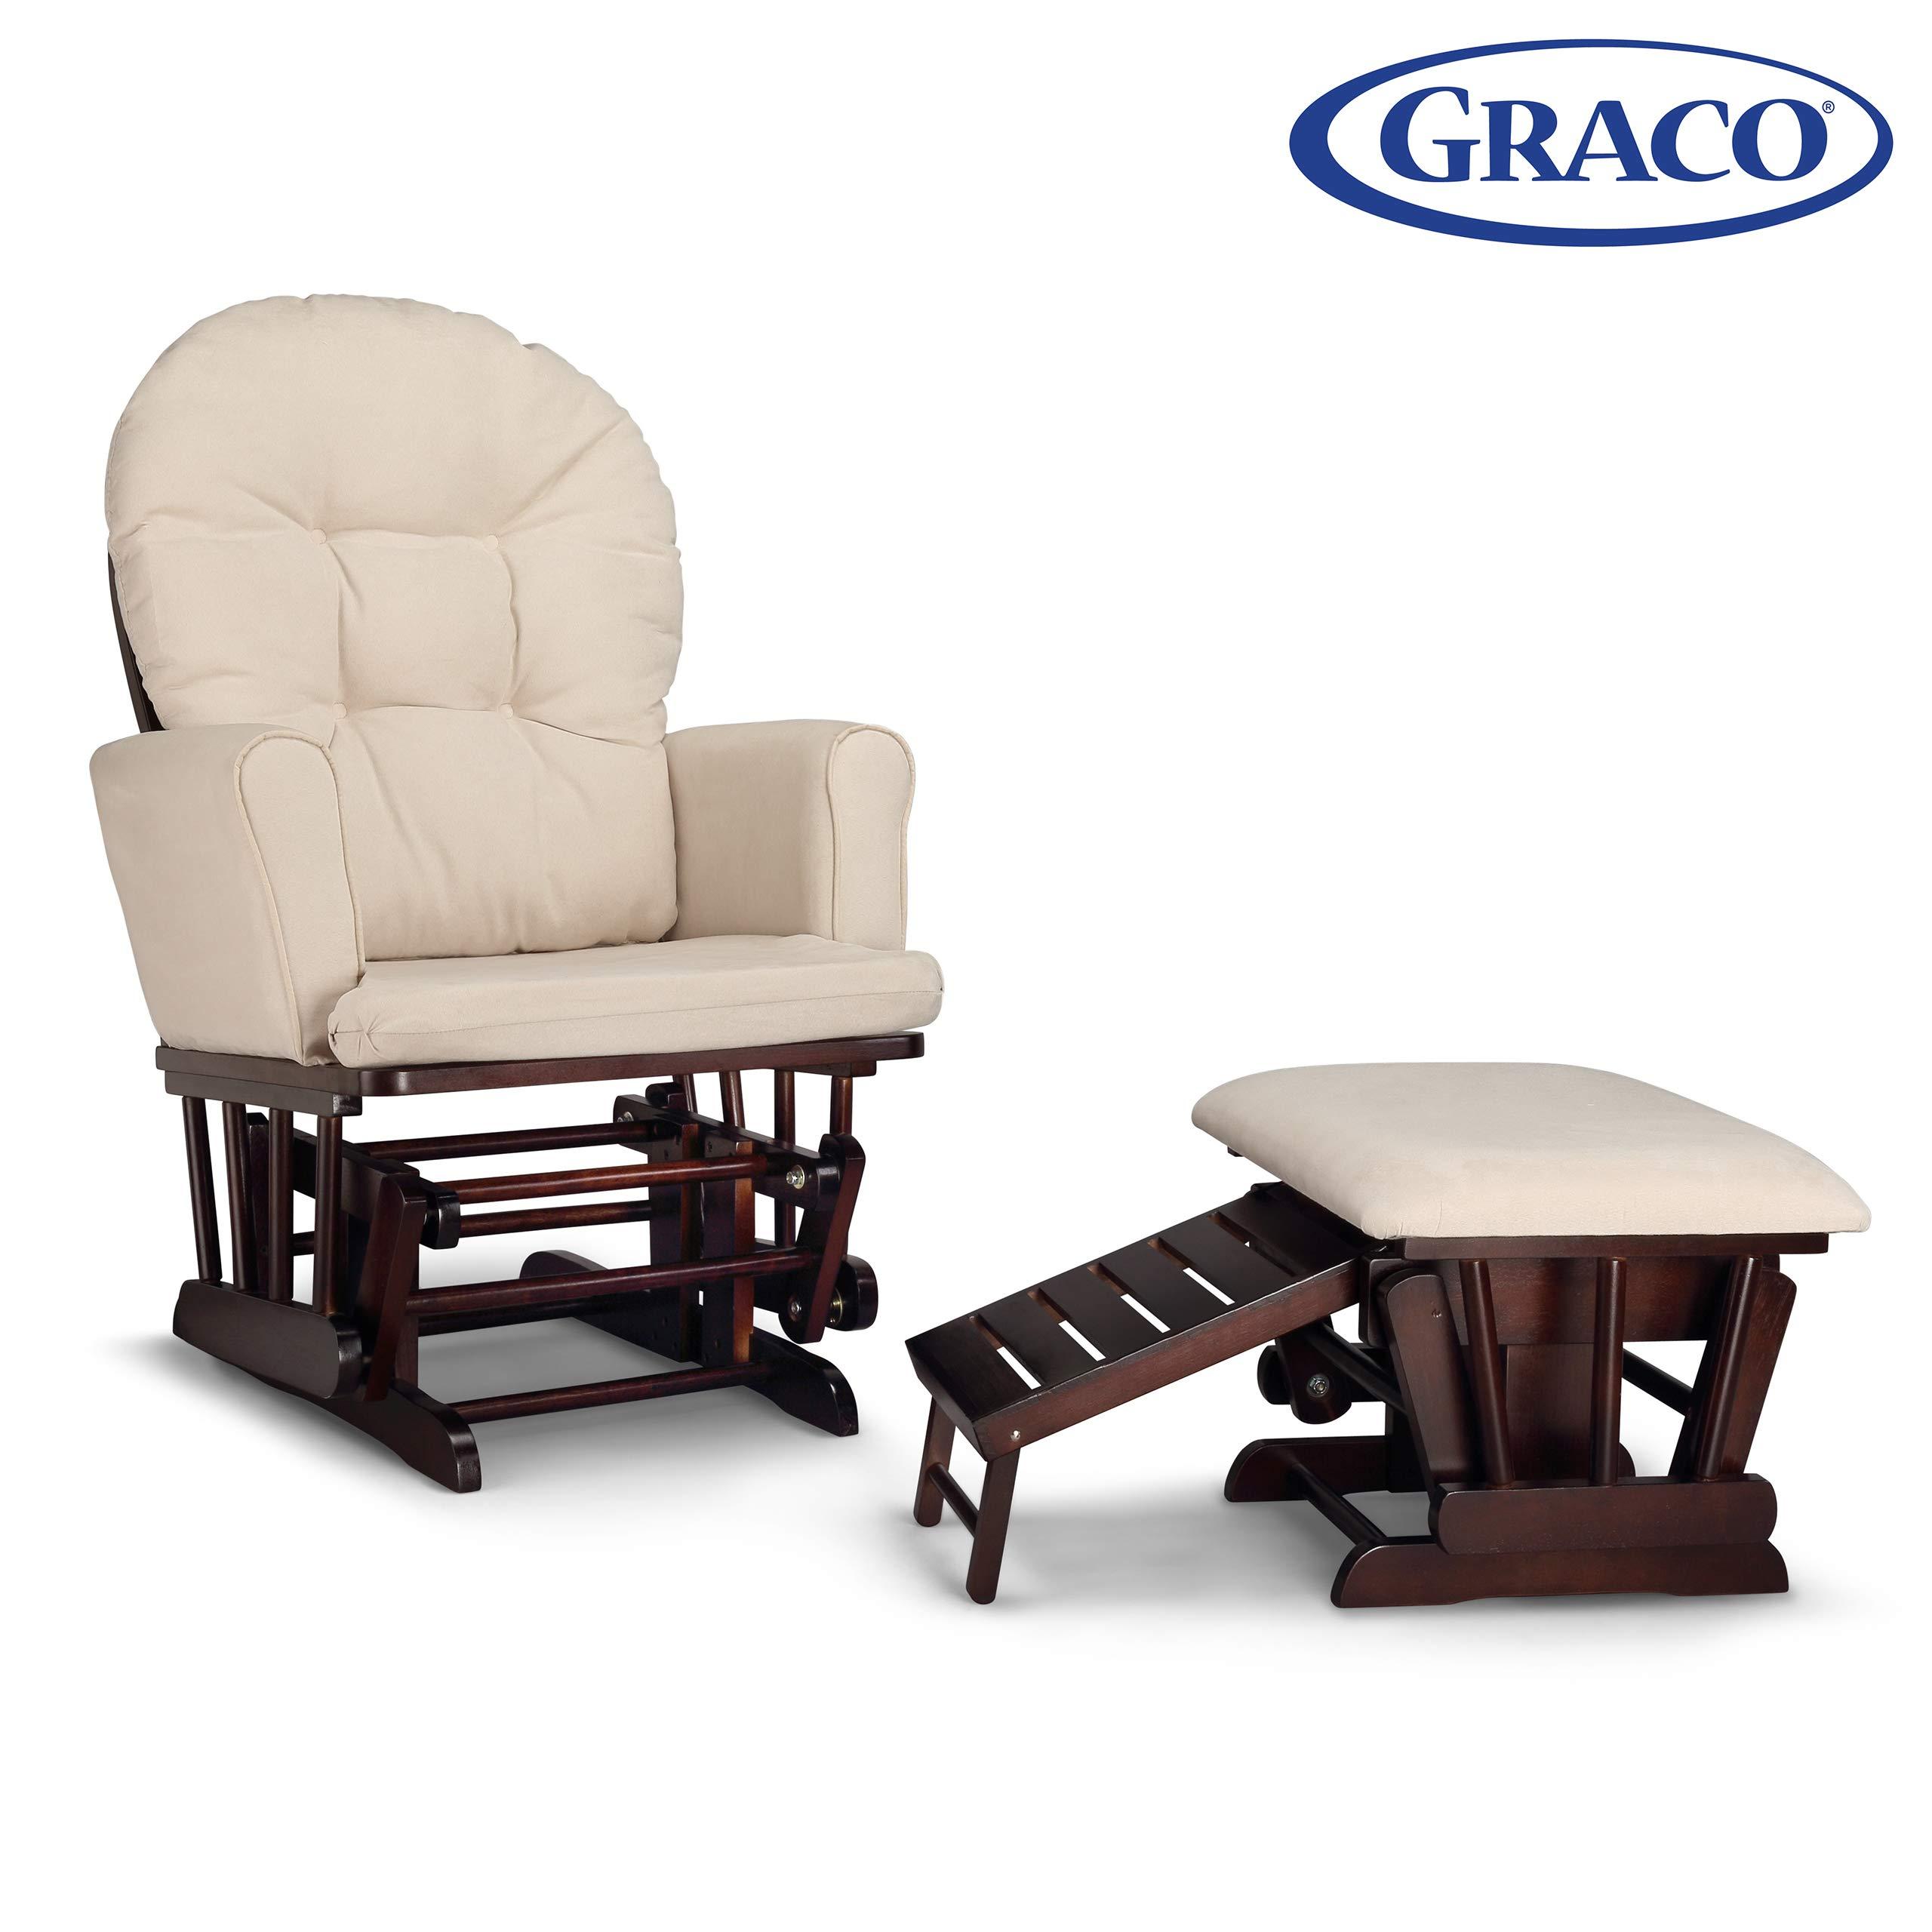 Semi Upholstered Nursing Espresso Cleanable Upholstered